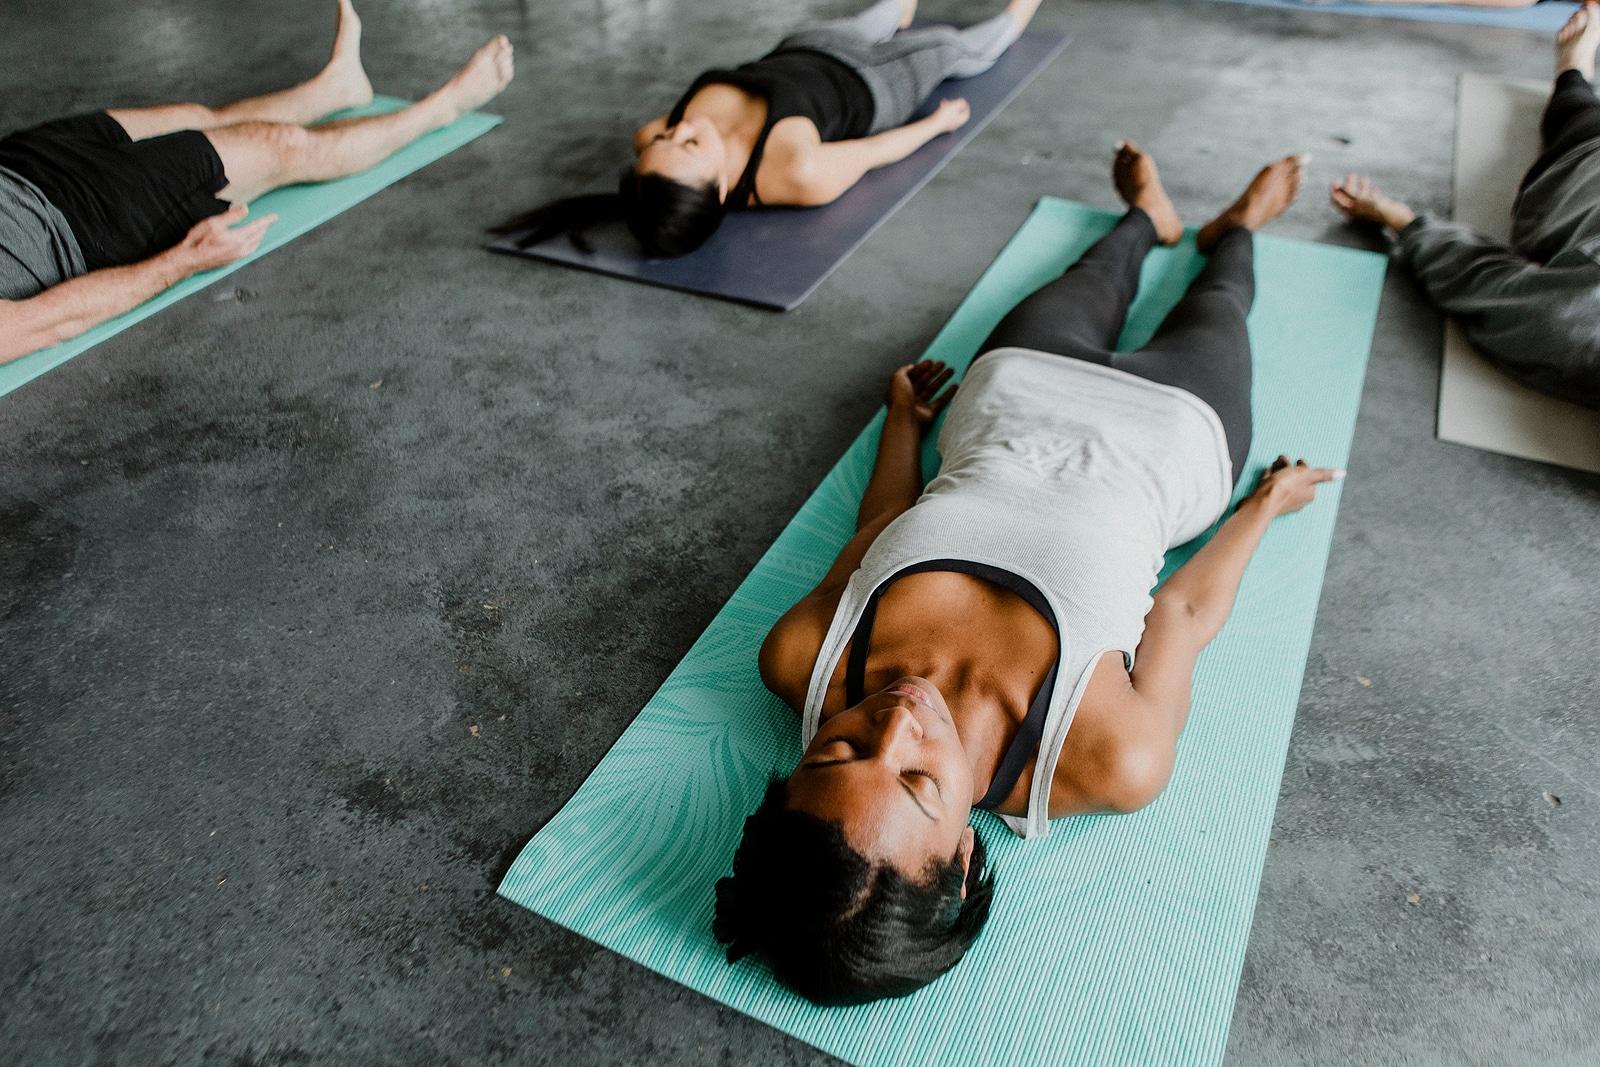 Can yoga help with hormonal imbalance?